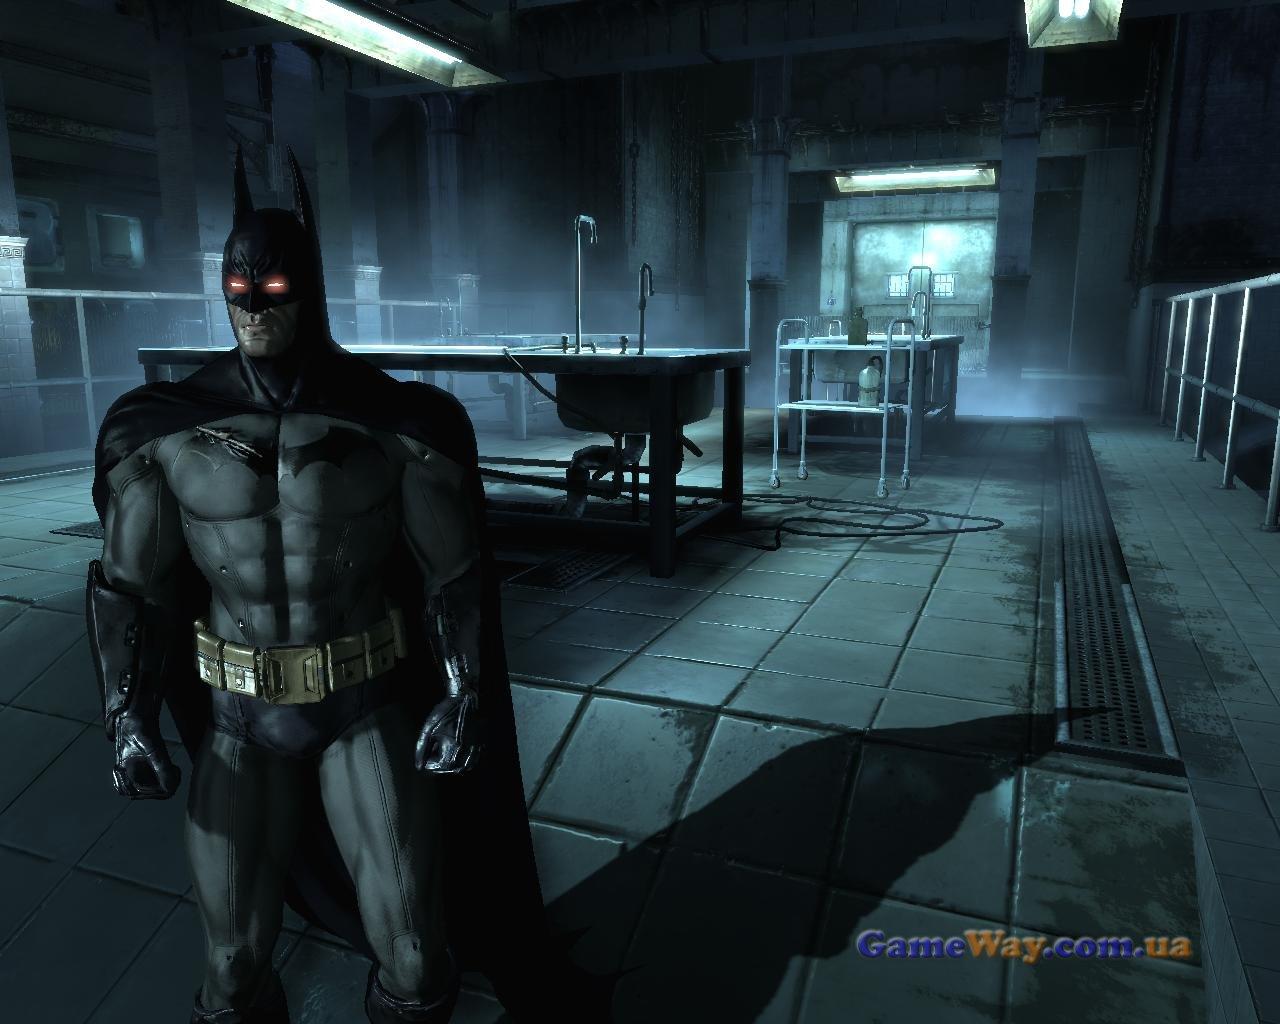 Batman: Arkham Asylum Game of the Year Edition (2010)